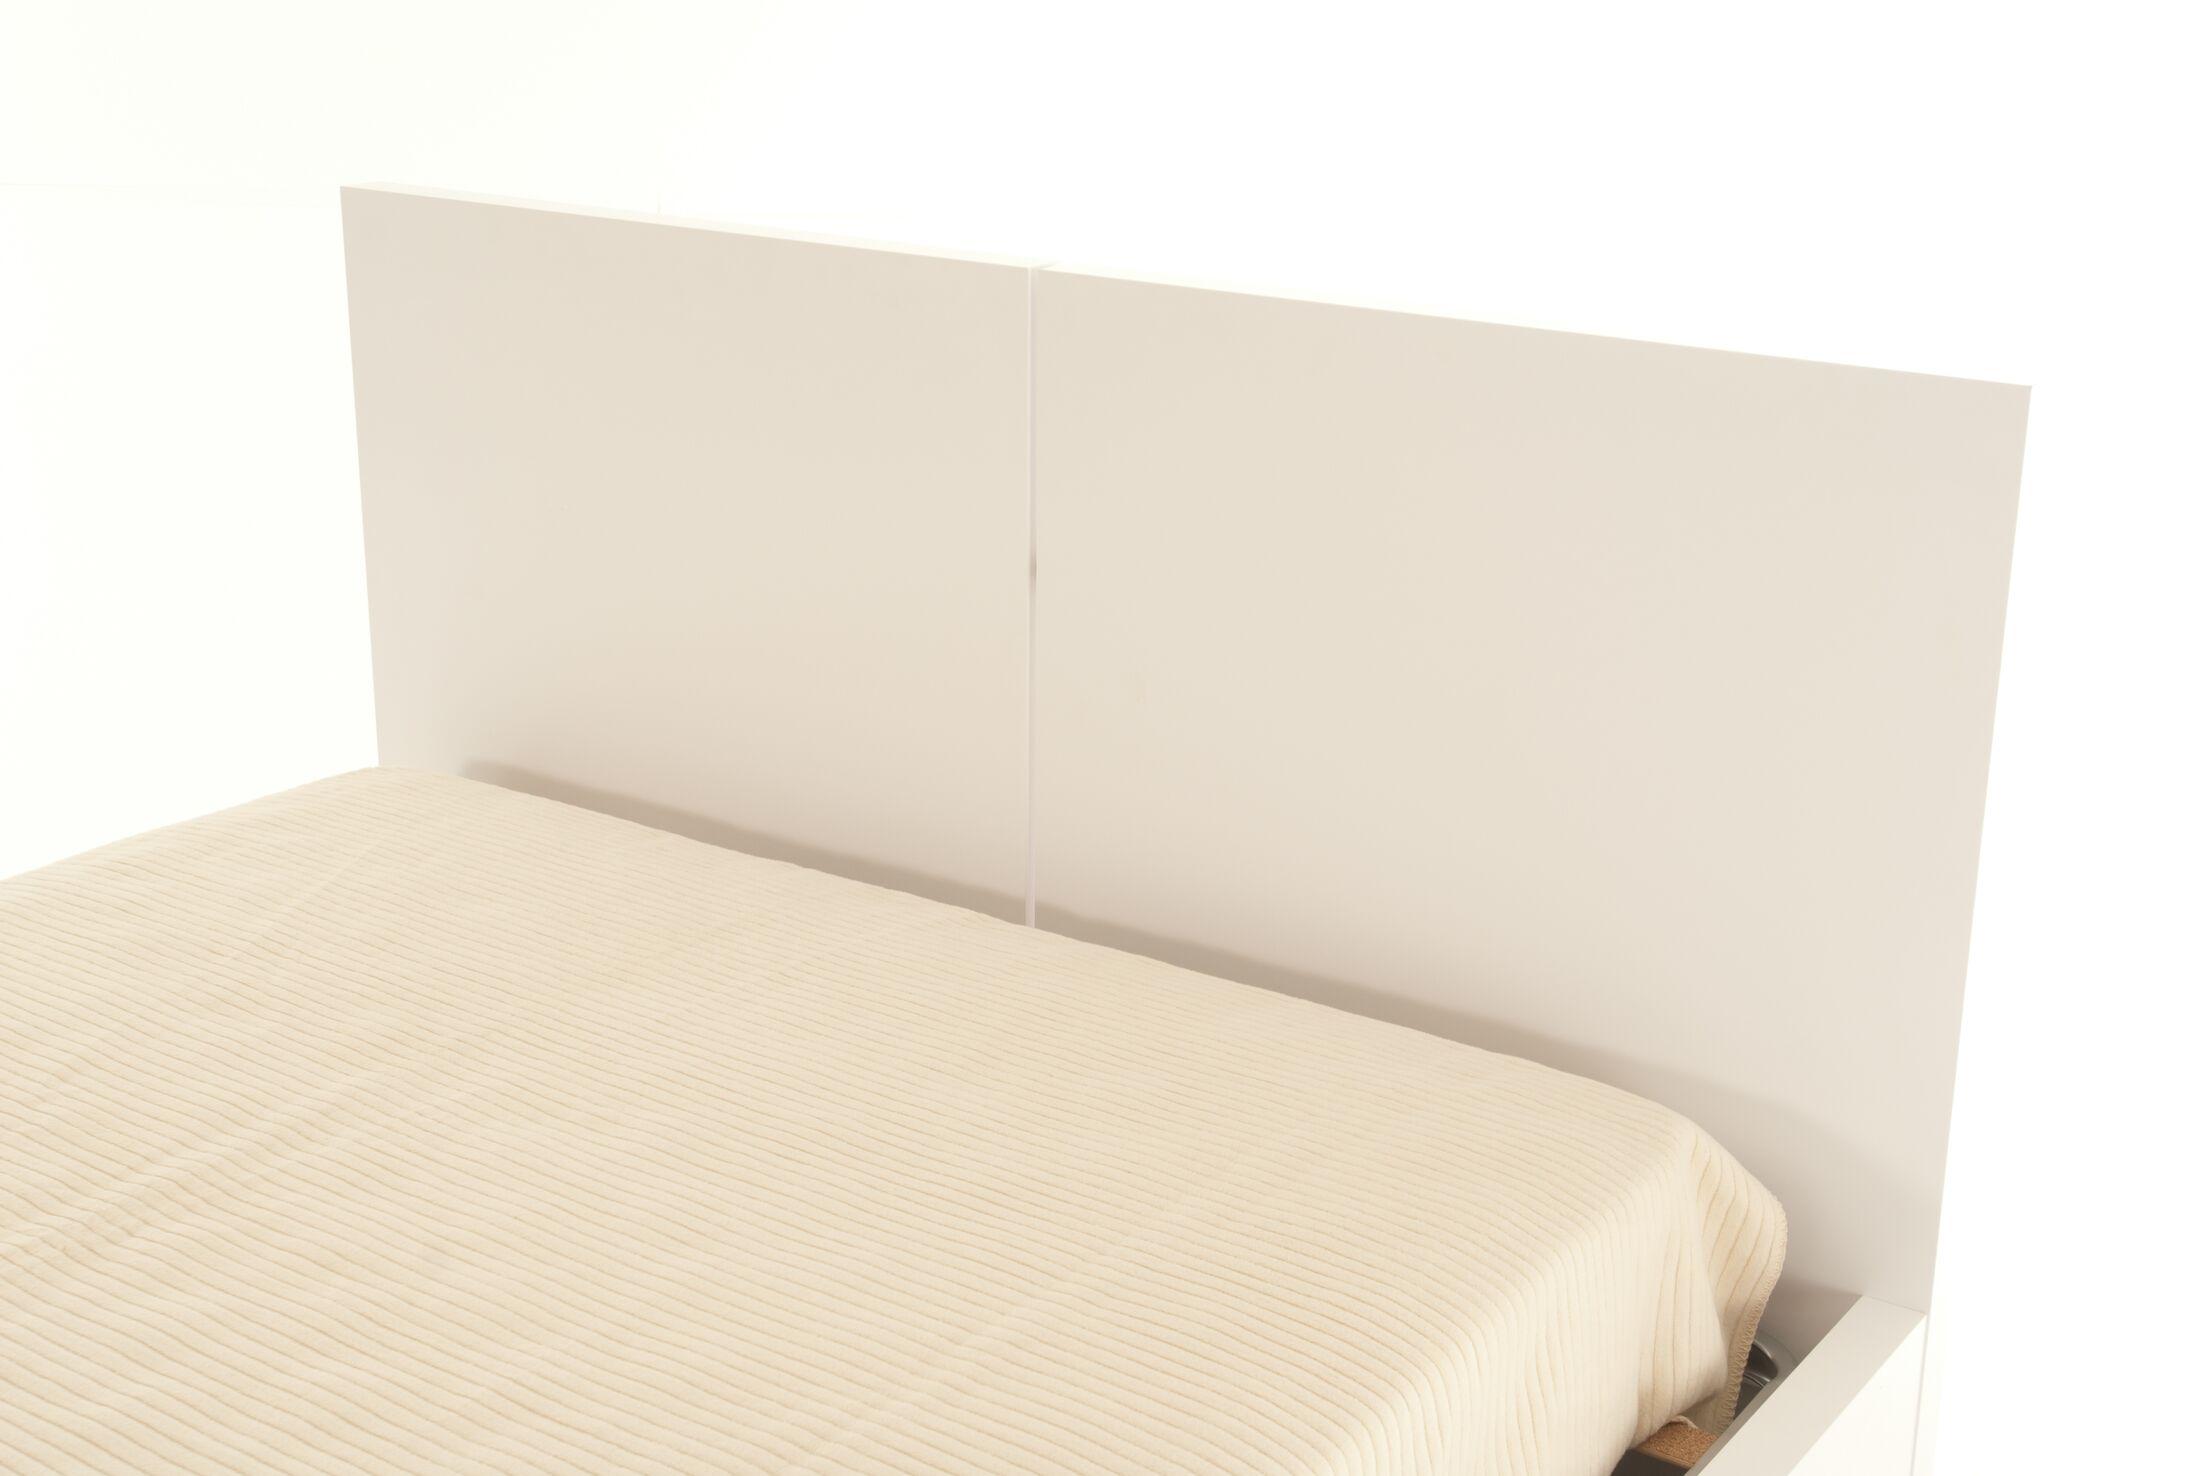 Horologium Platform Bed Color: Pure White, Size: King